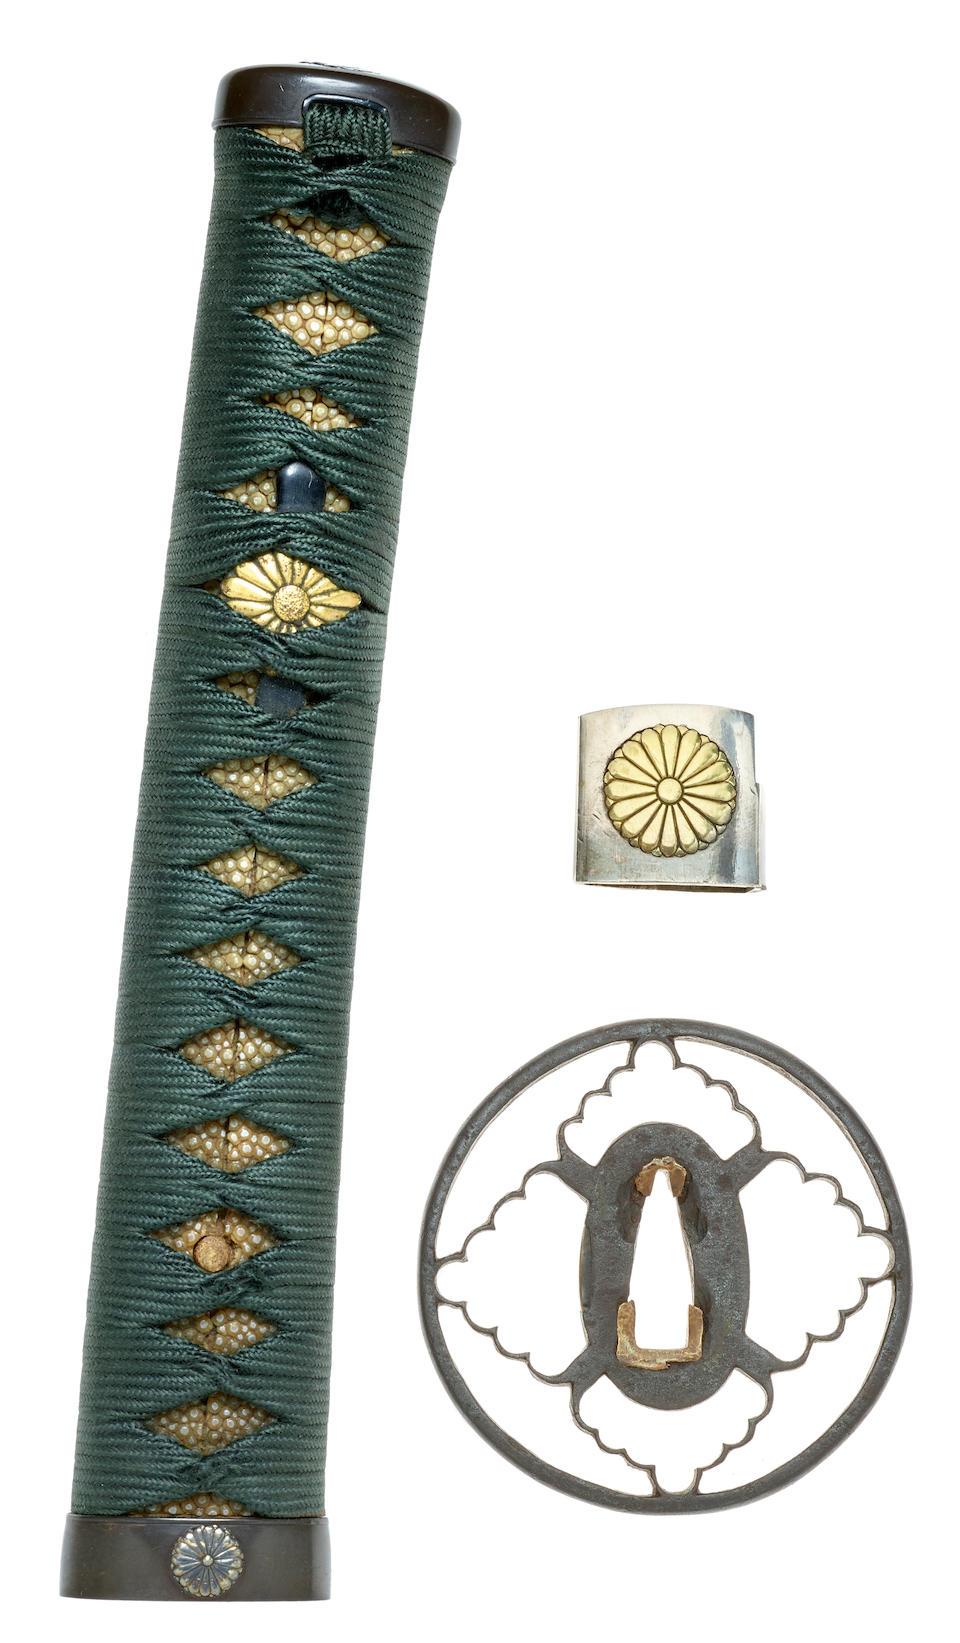 A koto tachi in mounts Attributed to Rai Kuniyuki, Kamakura period (1185-1333), circa 1240